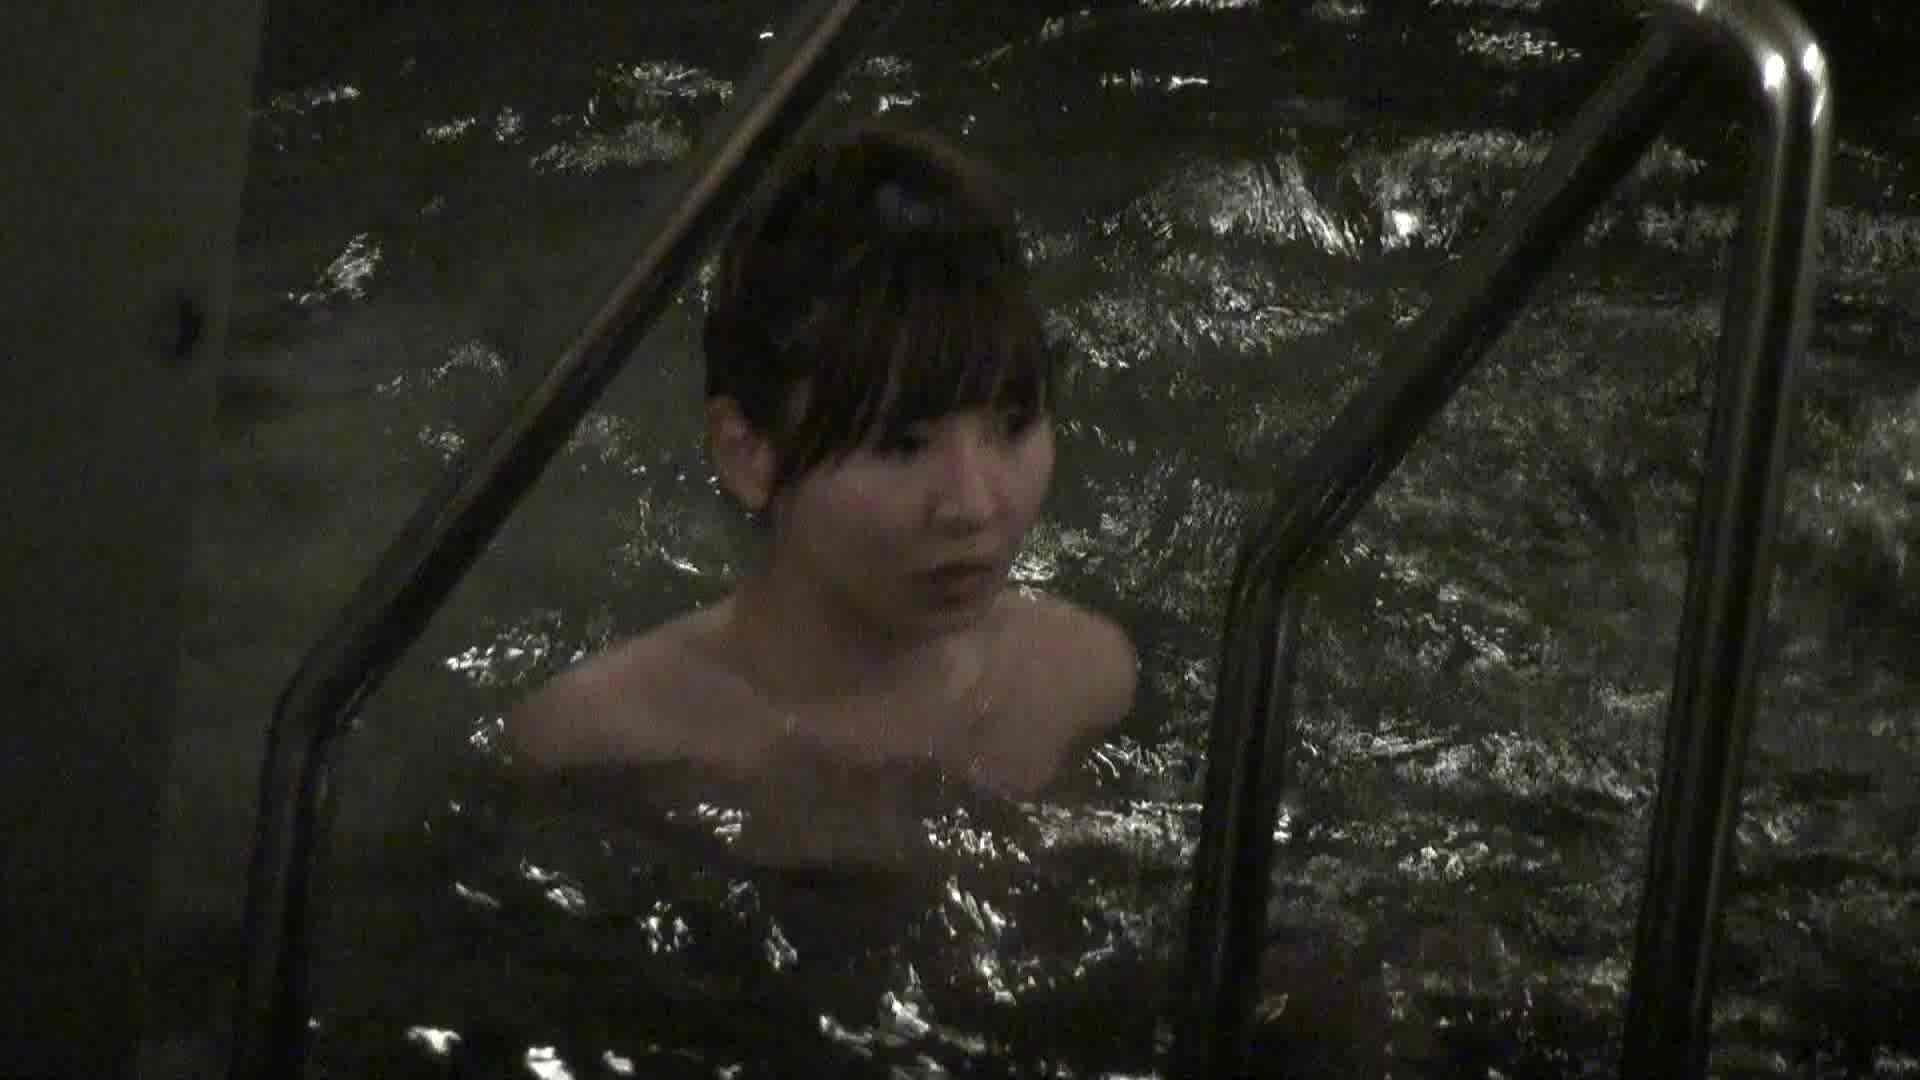 Aquaな露天風呂Vol.410 HなOL  76pic 68